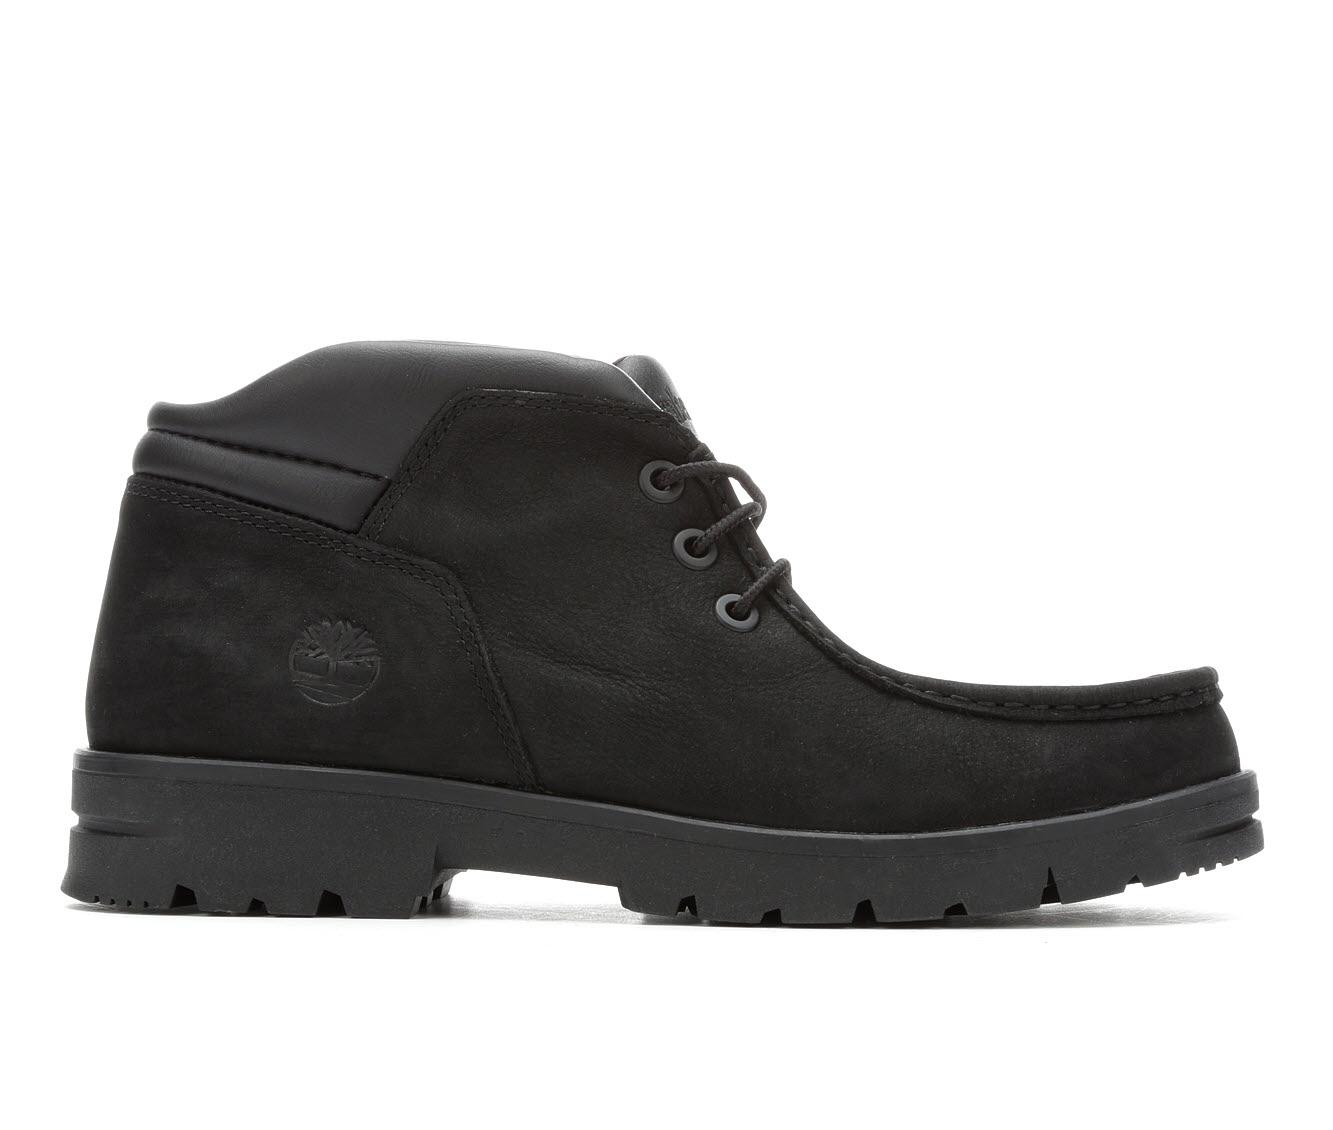 Timberland Newtonbrook Moc Toe Chukka Men's Boots (Black Leather)